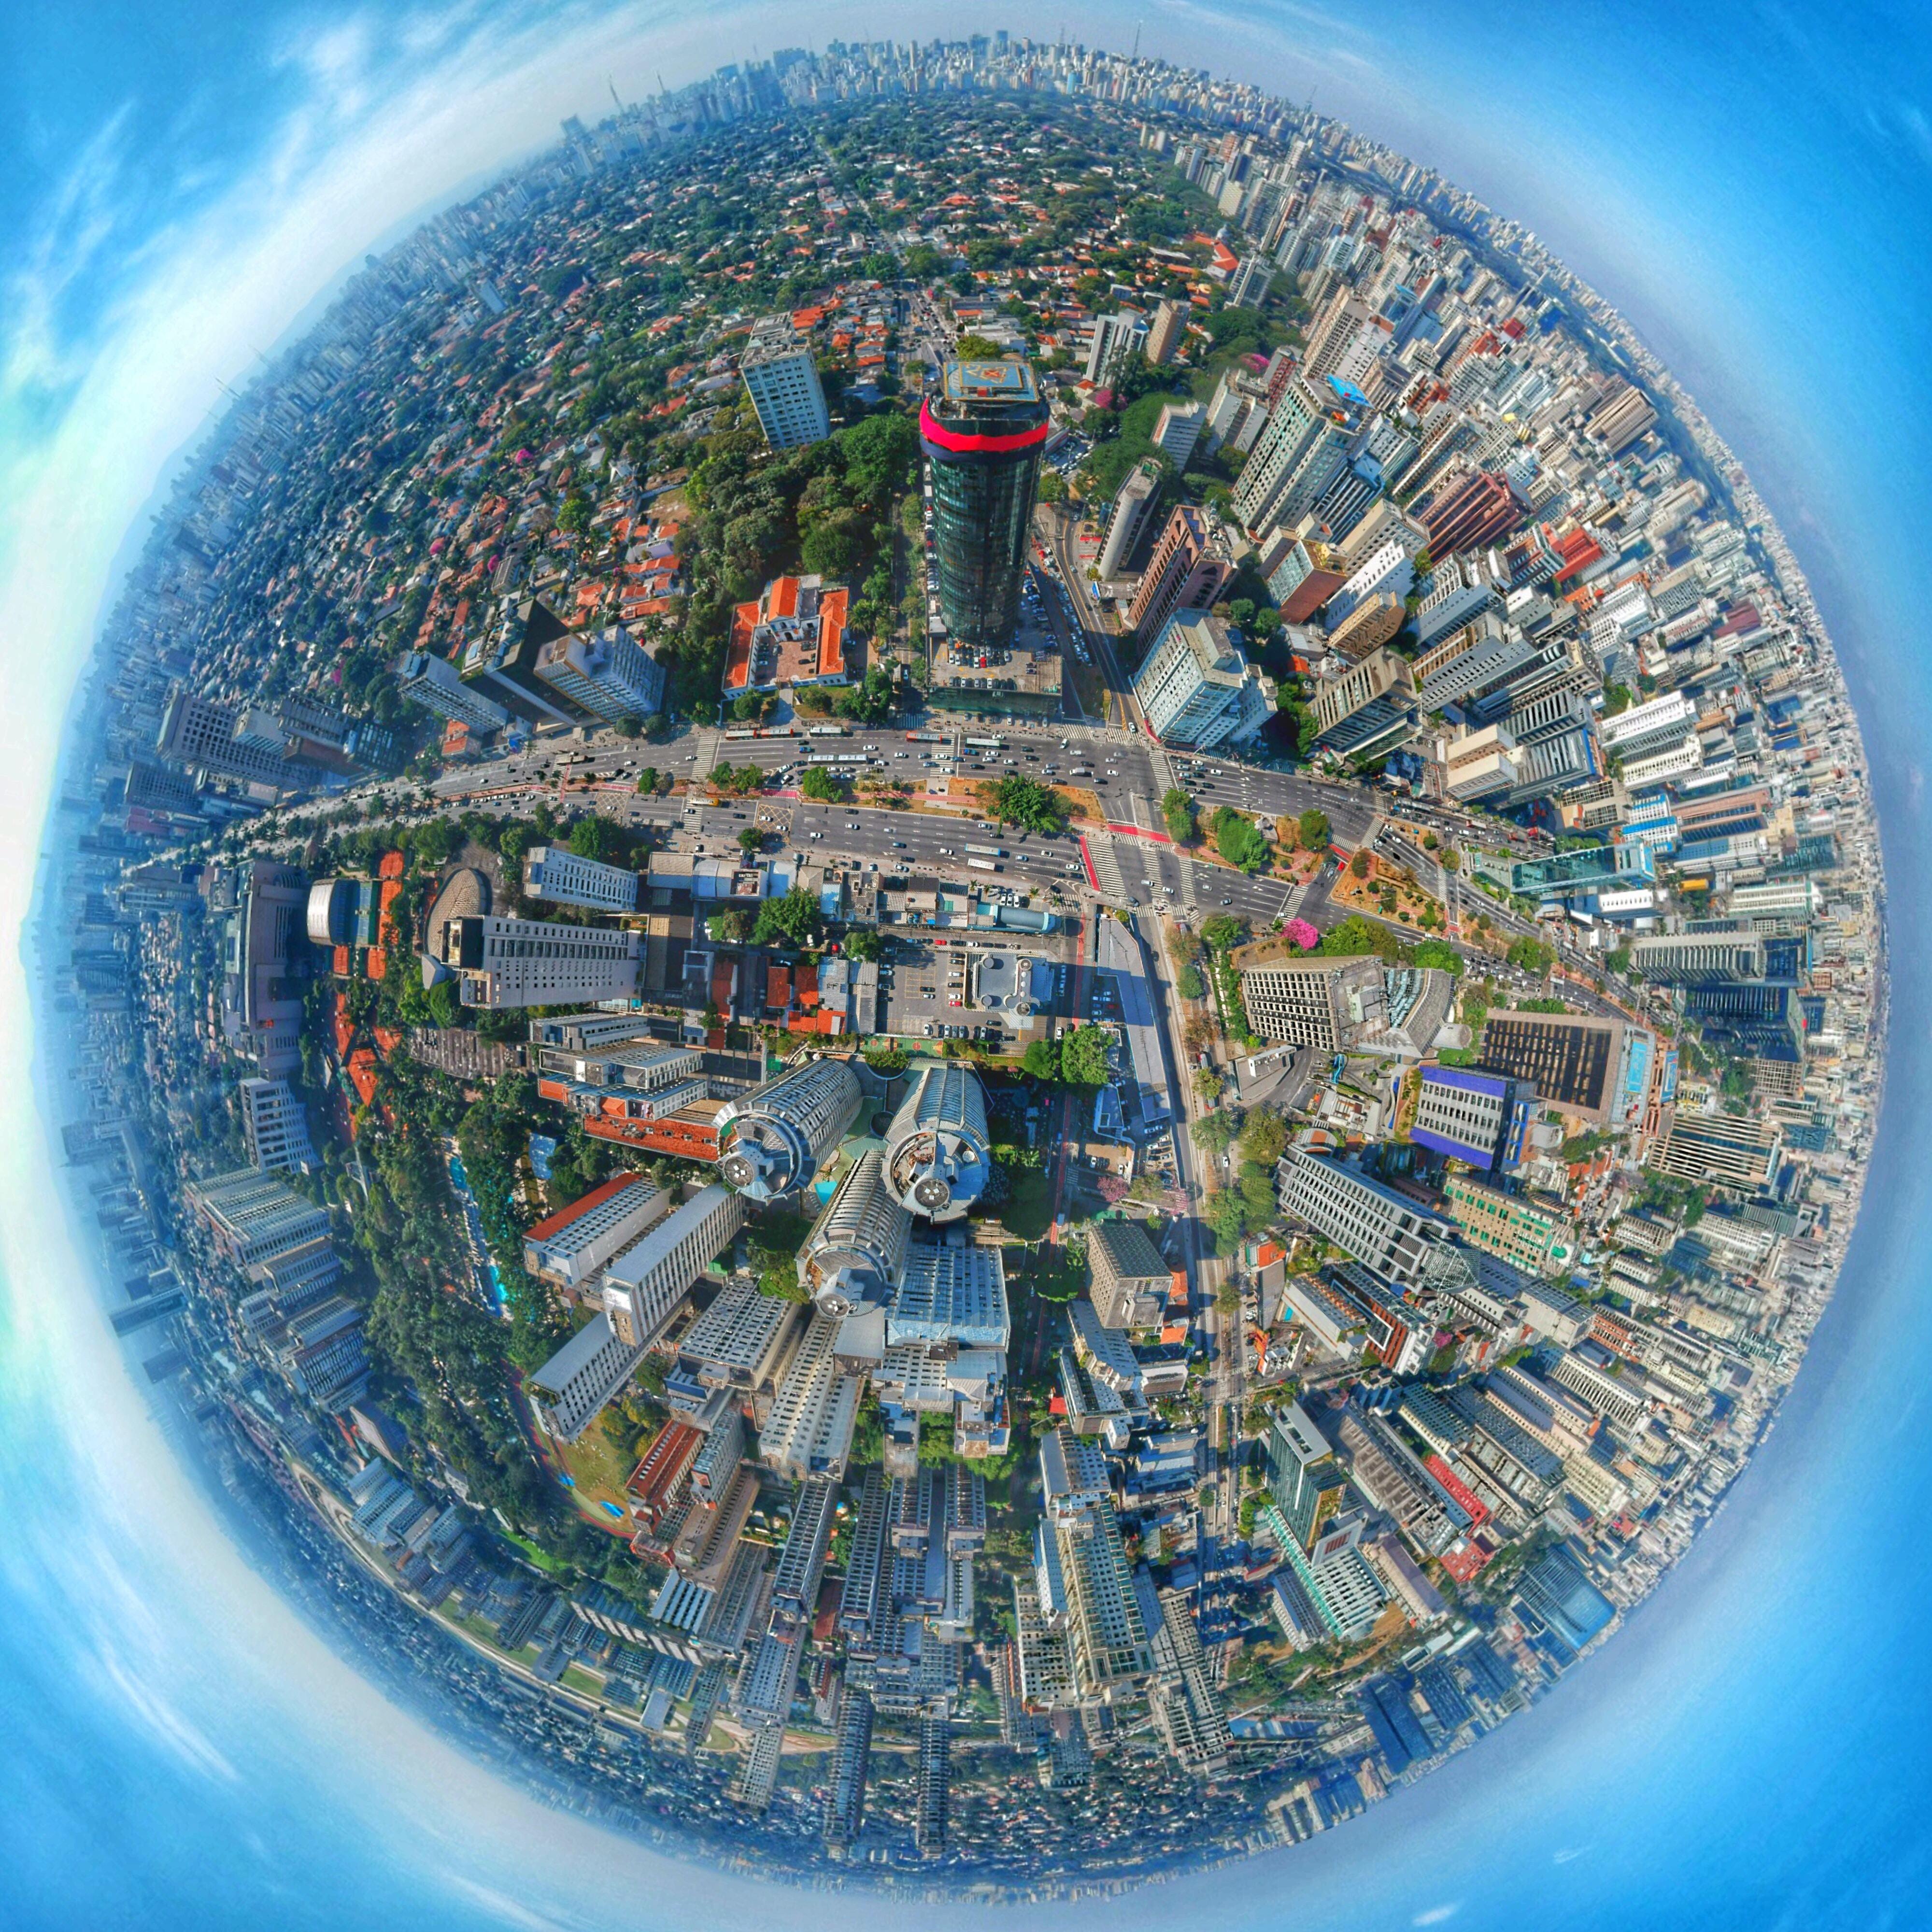 fisheye lens photography of city